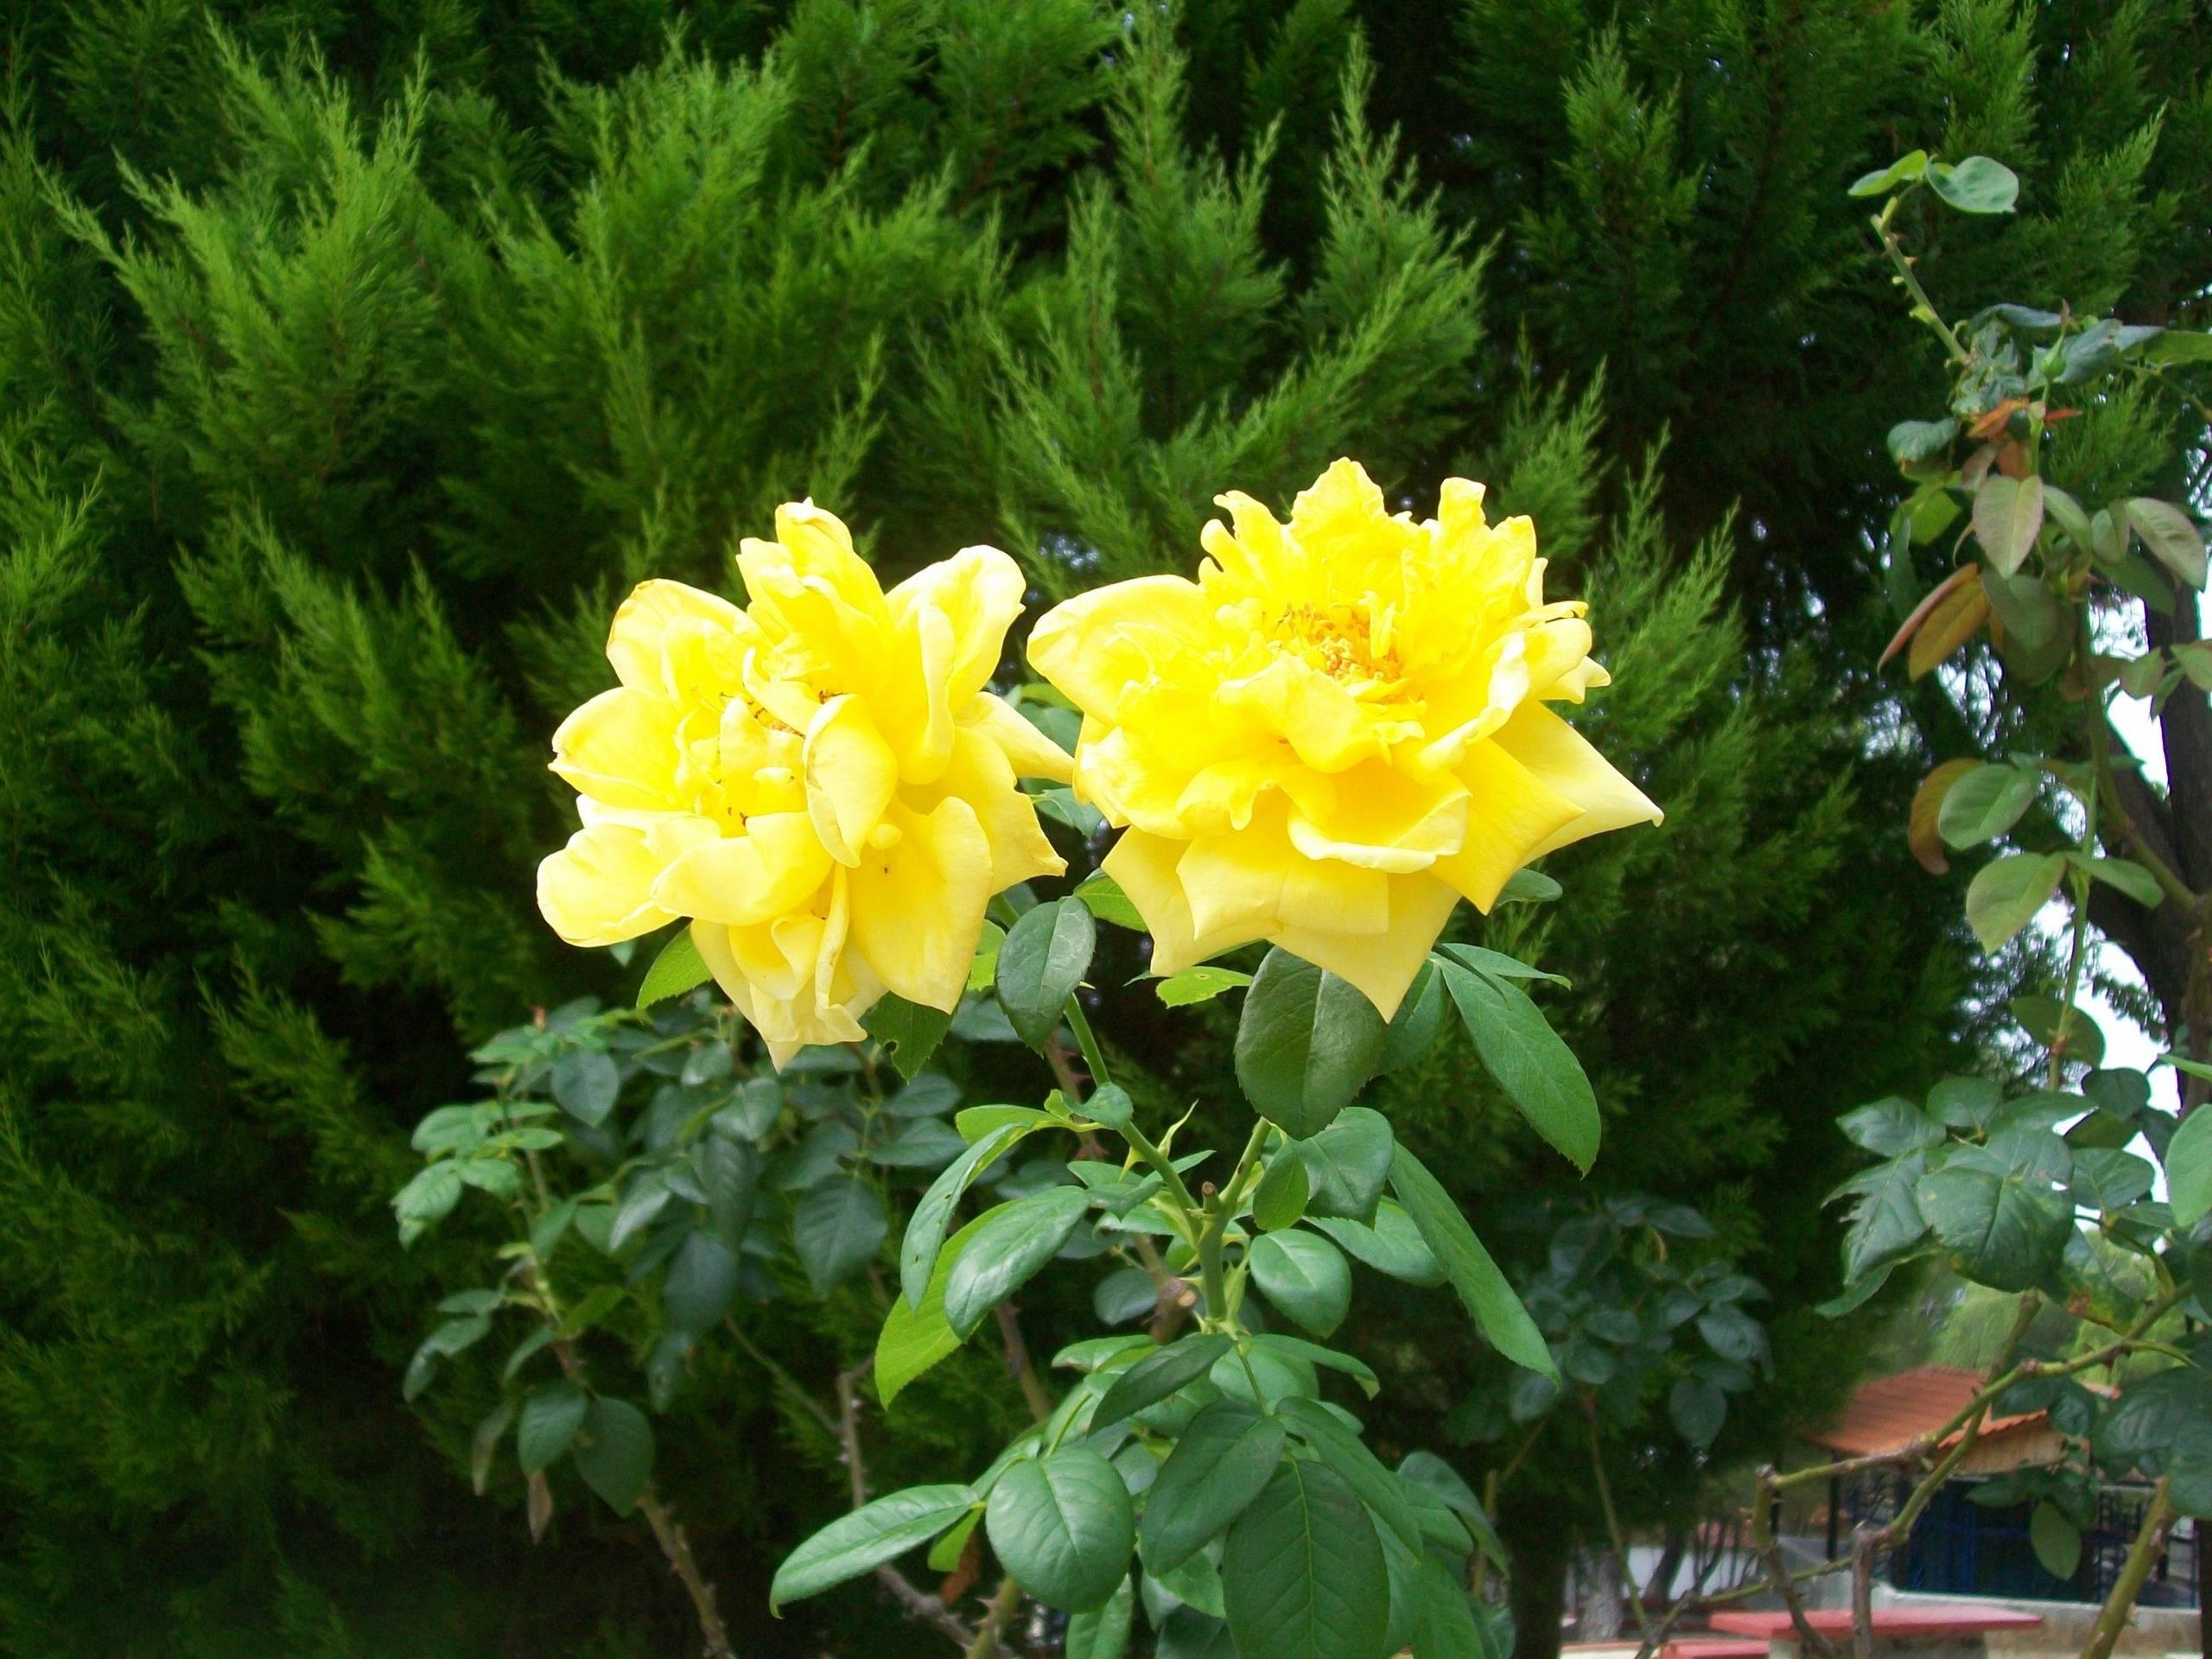 Hd wallpaper yellow flowers - Yellow Rose Widescreen Desktop Wallpaper Hd Wallpapers